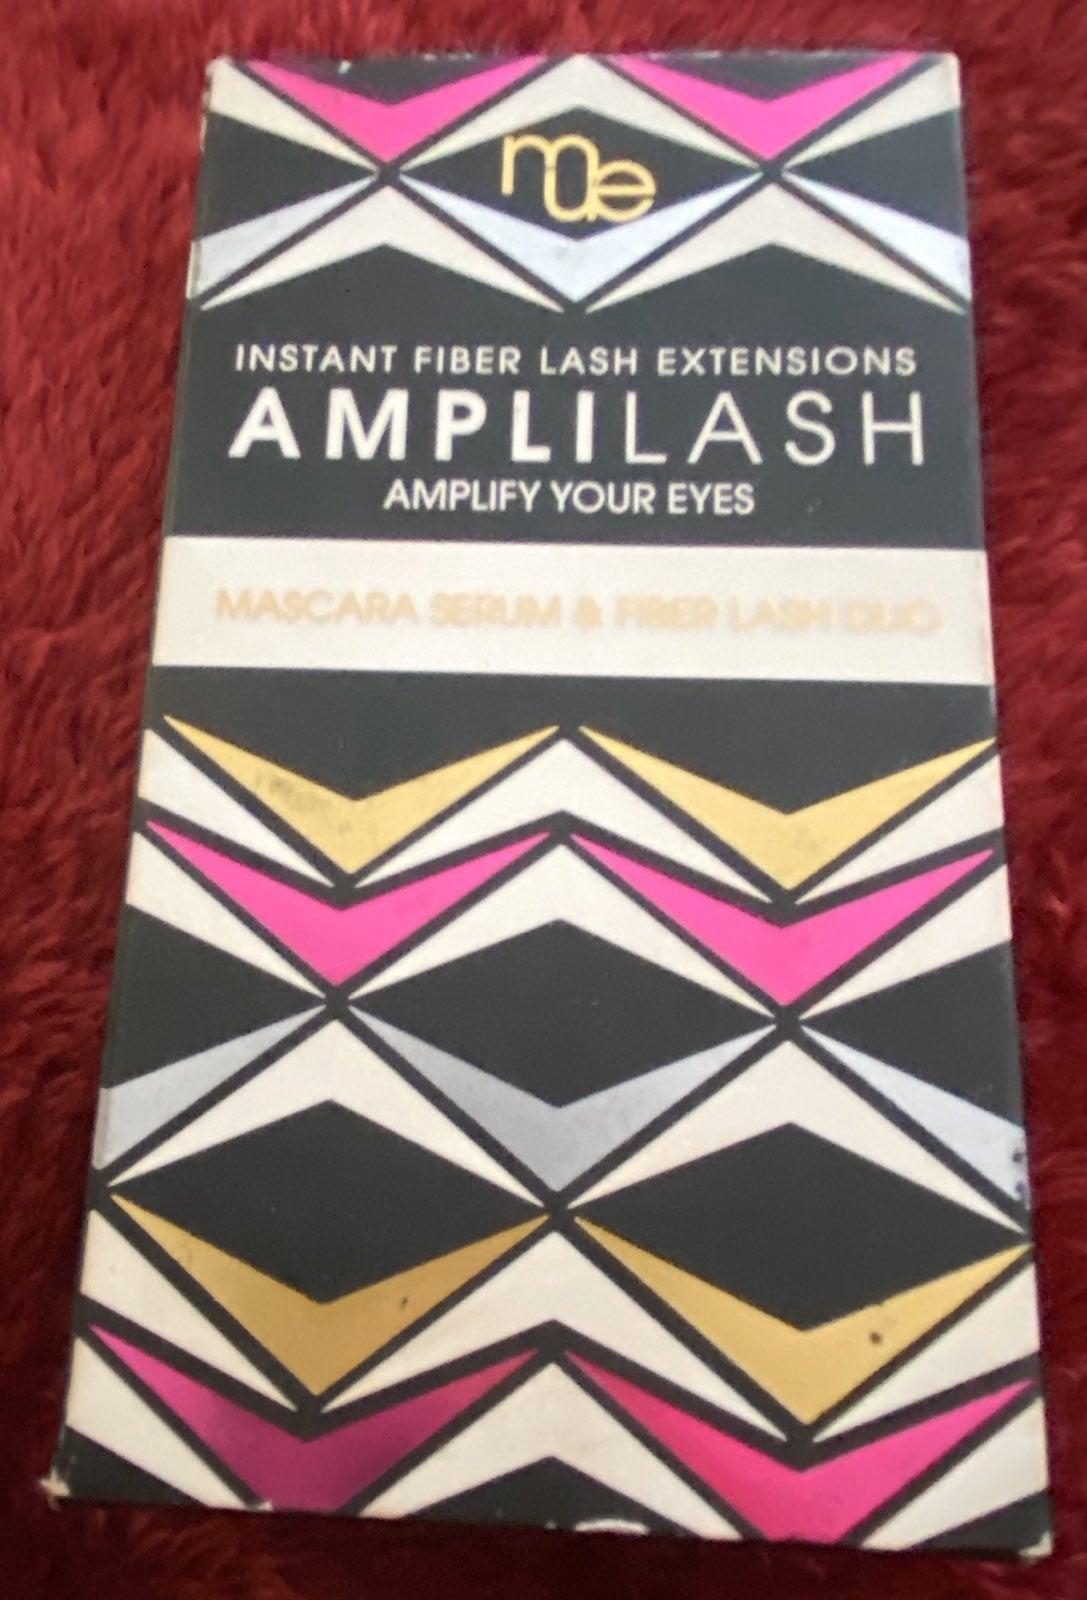 AmpliLash Instant Fiber Lashed